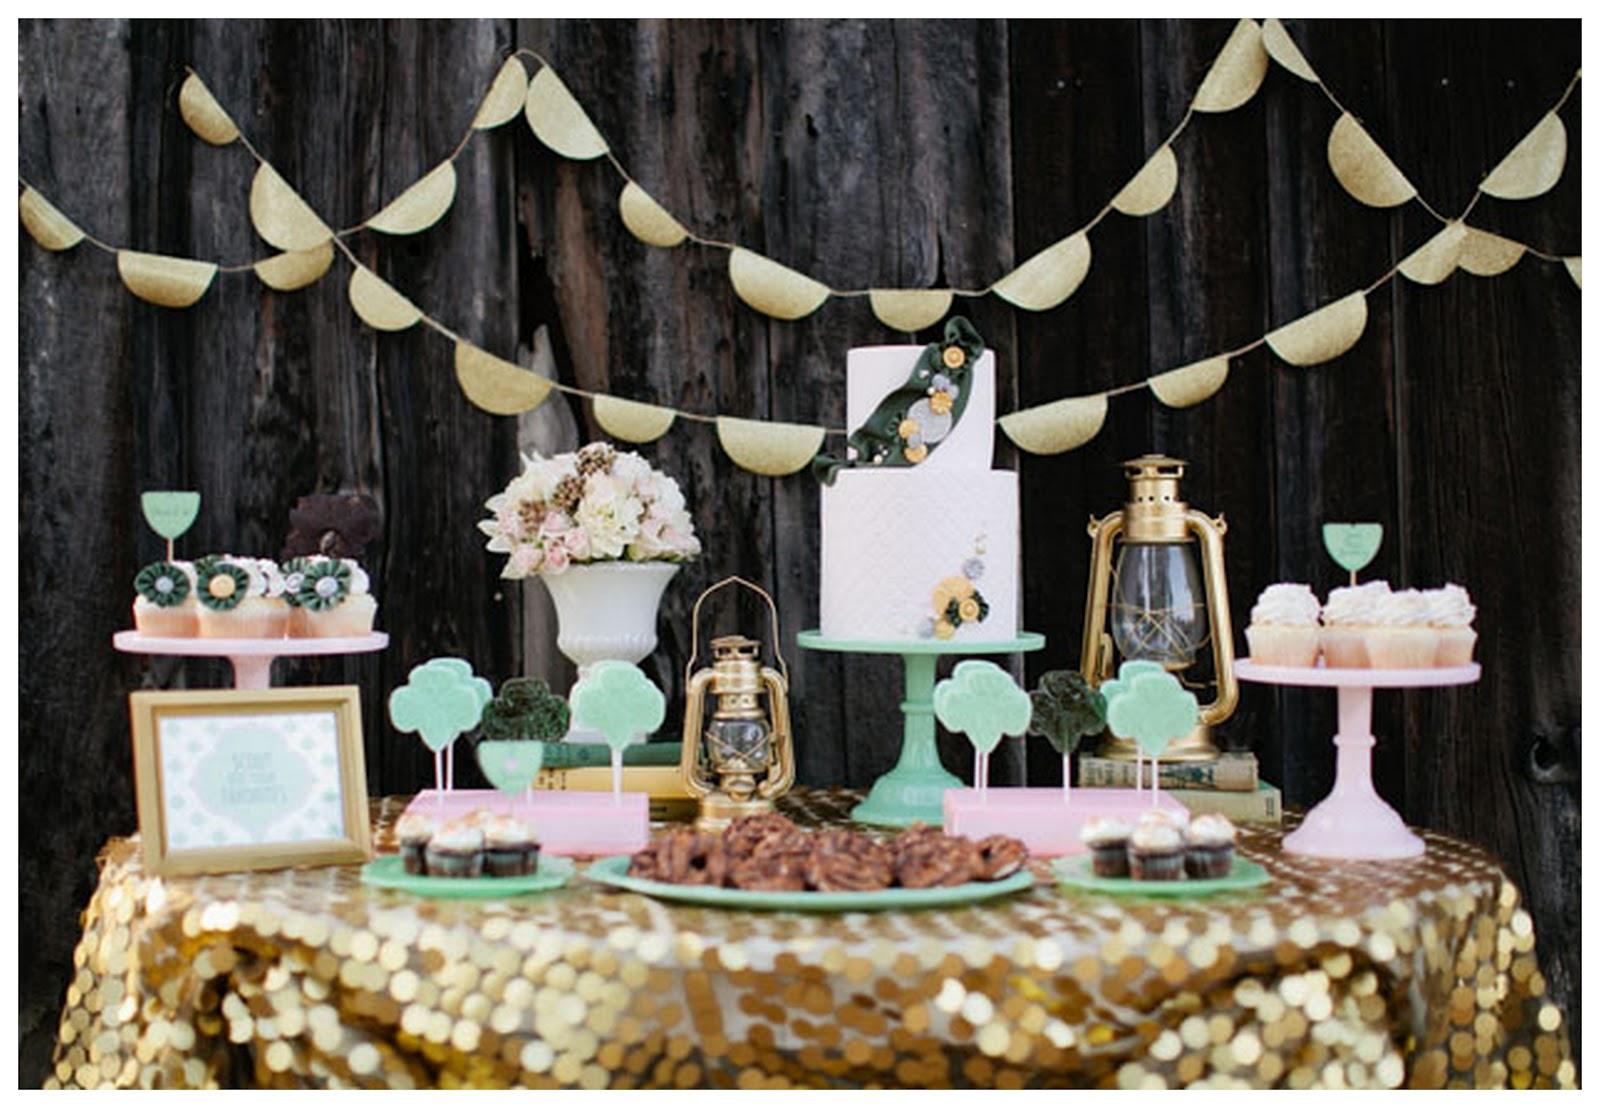 Hen Party At Home Ideas: Brilliant Bridal Shower Hen Party Theme Idea